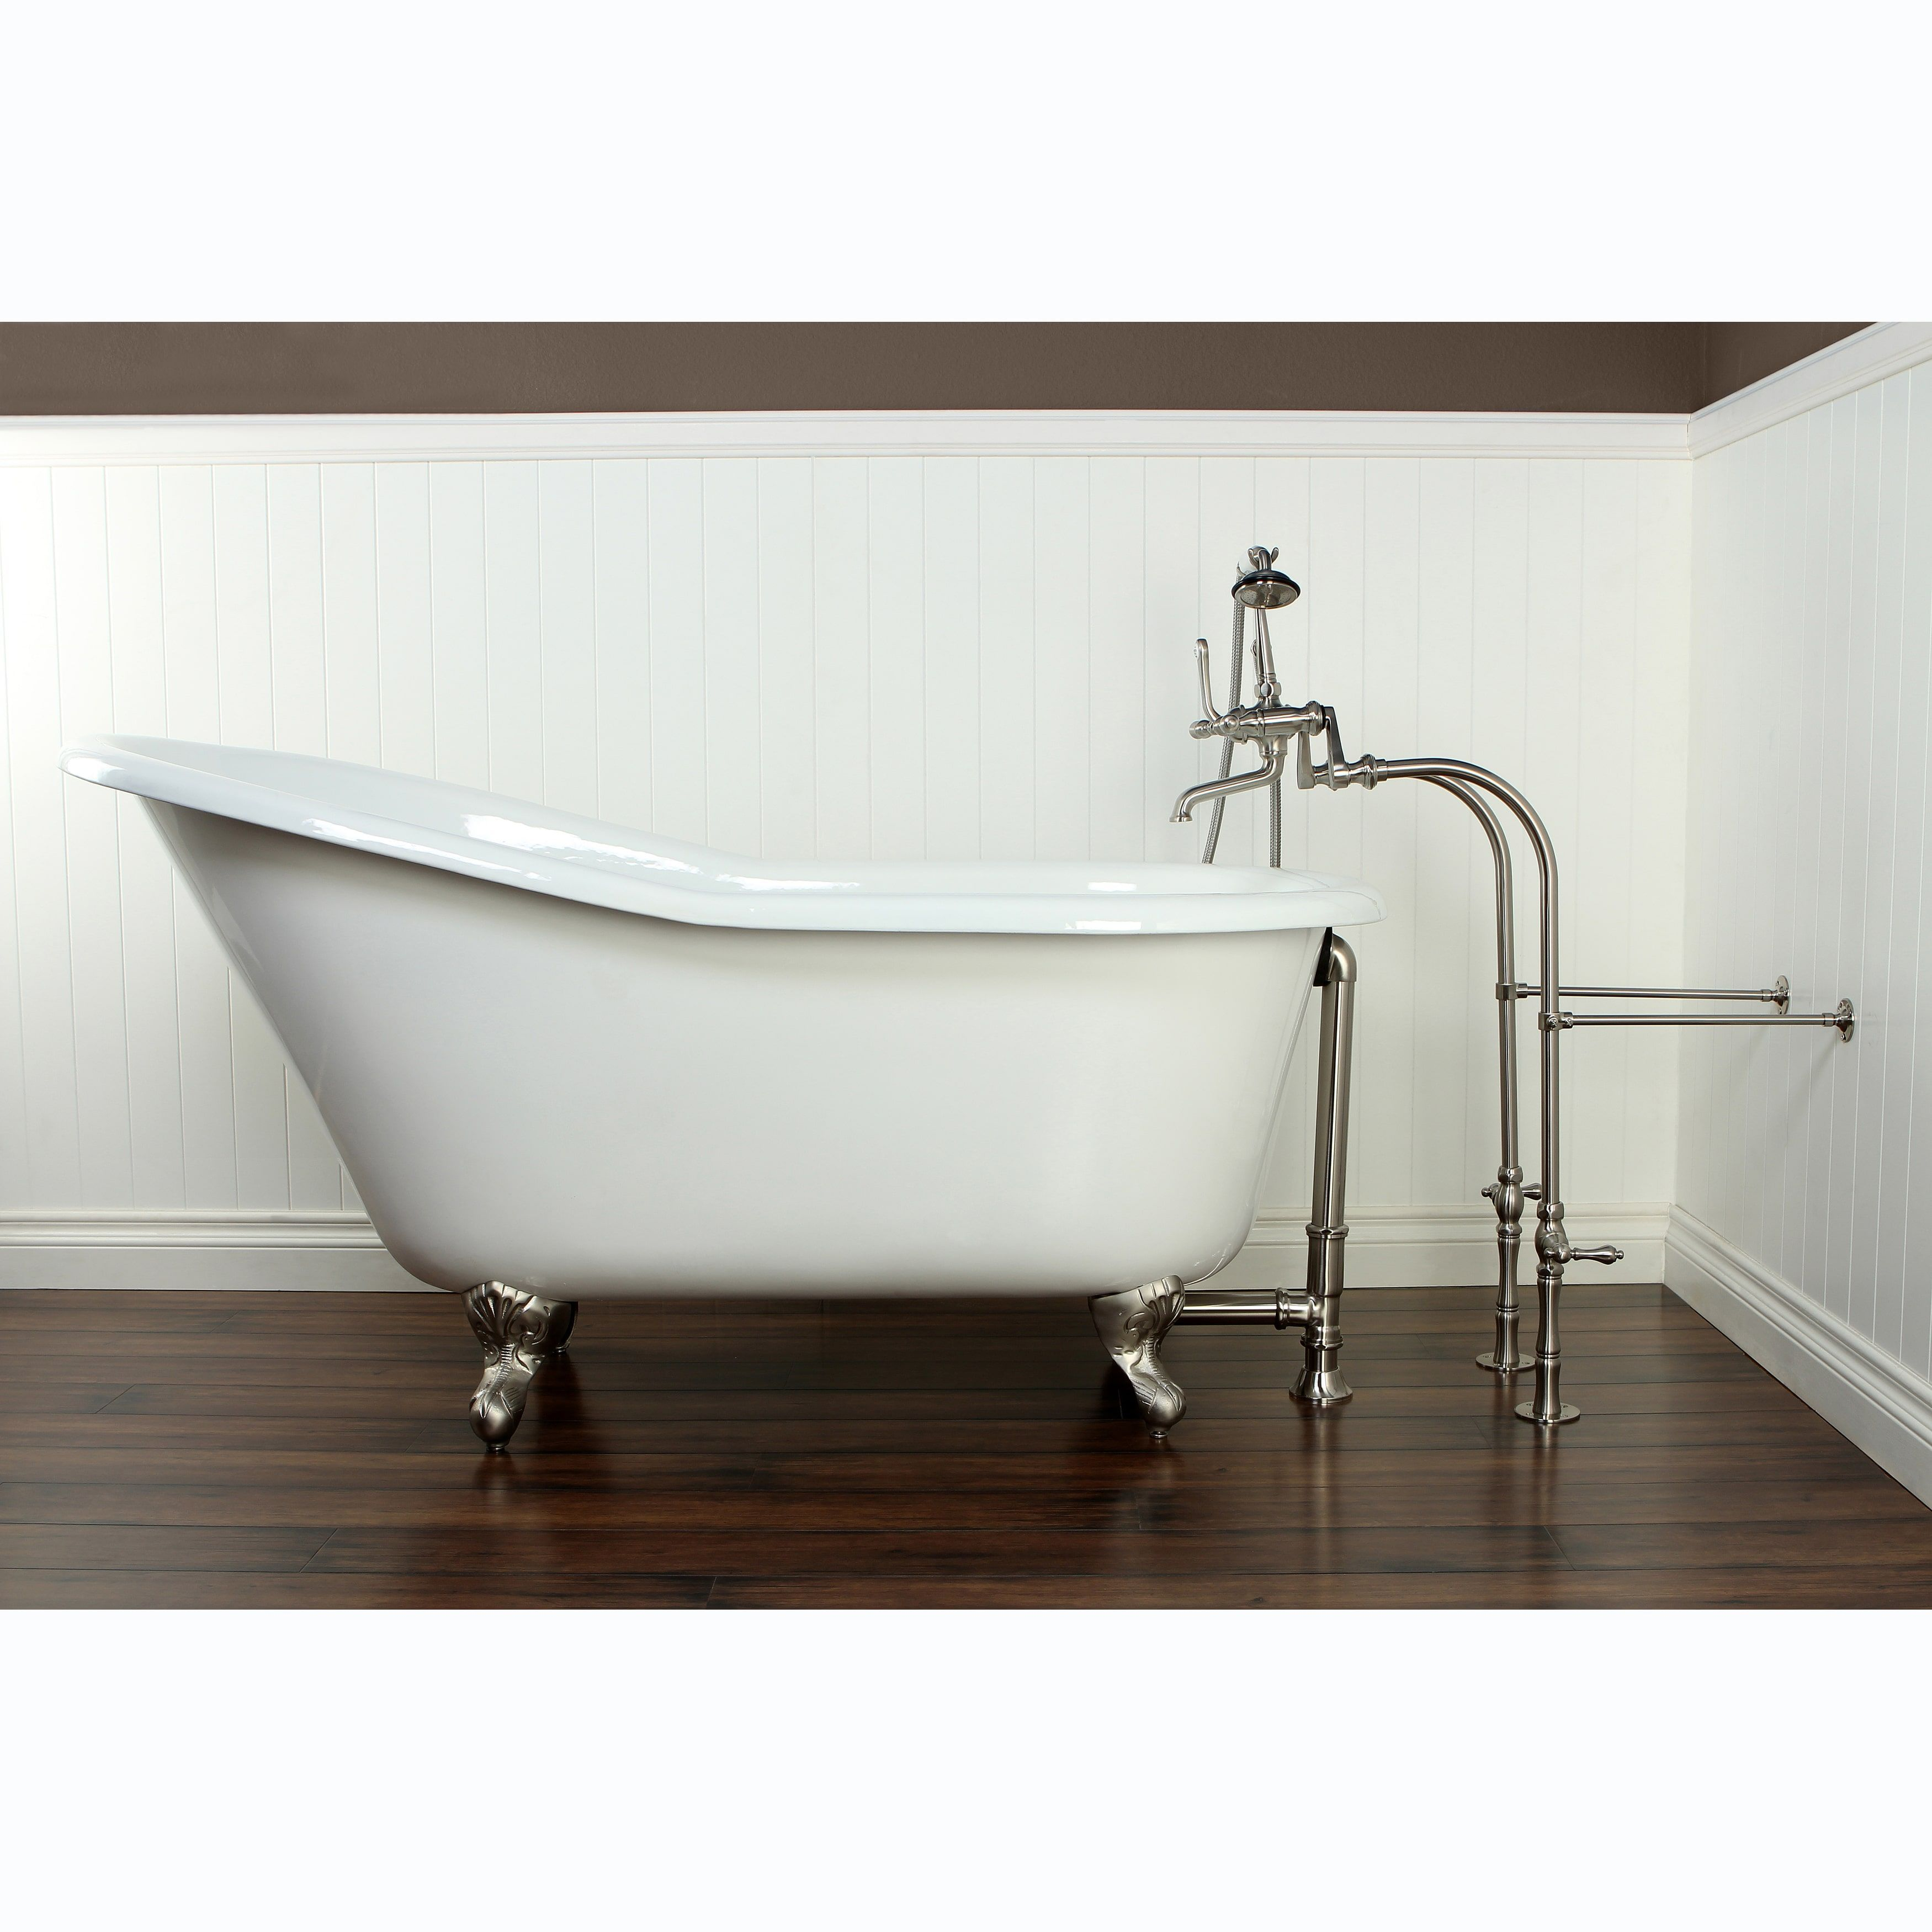 Kingston brass slipper cast iron inch clawfoot bathtub chrome